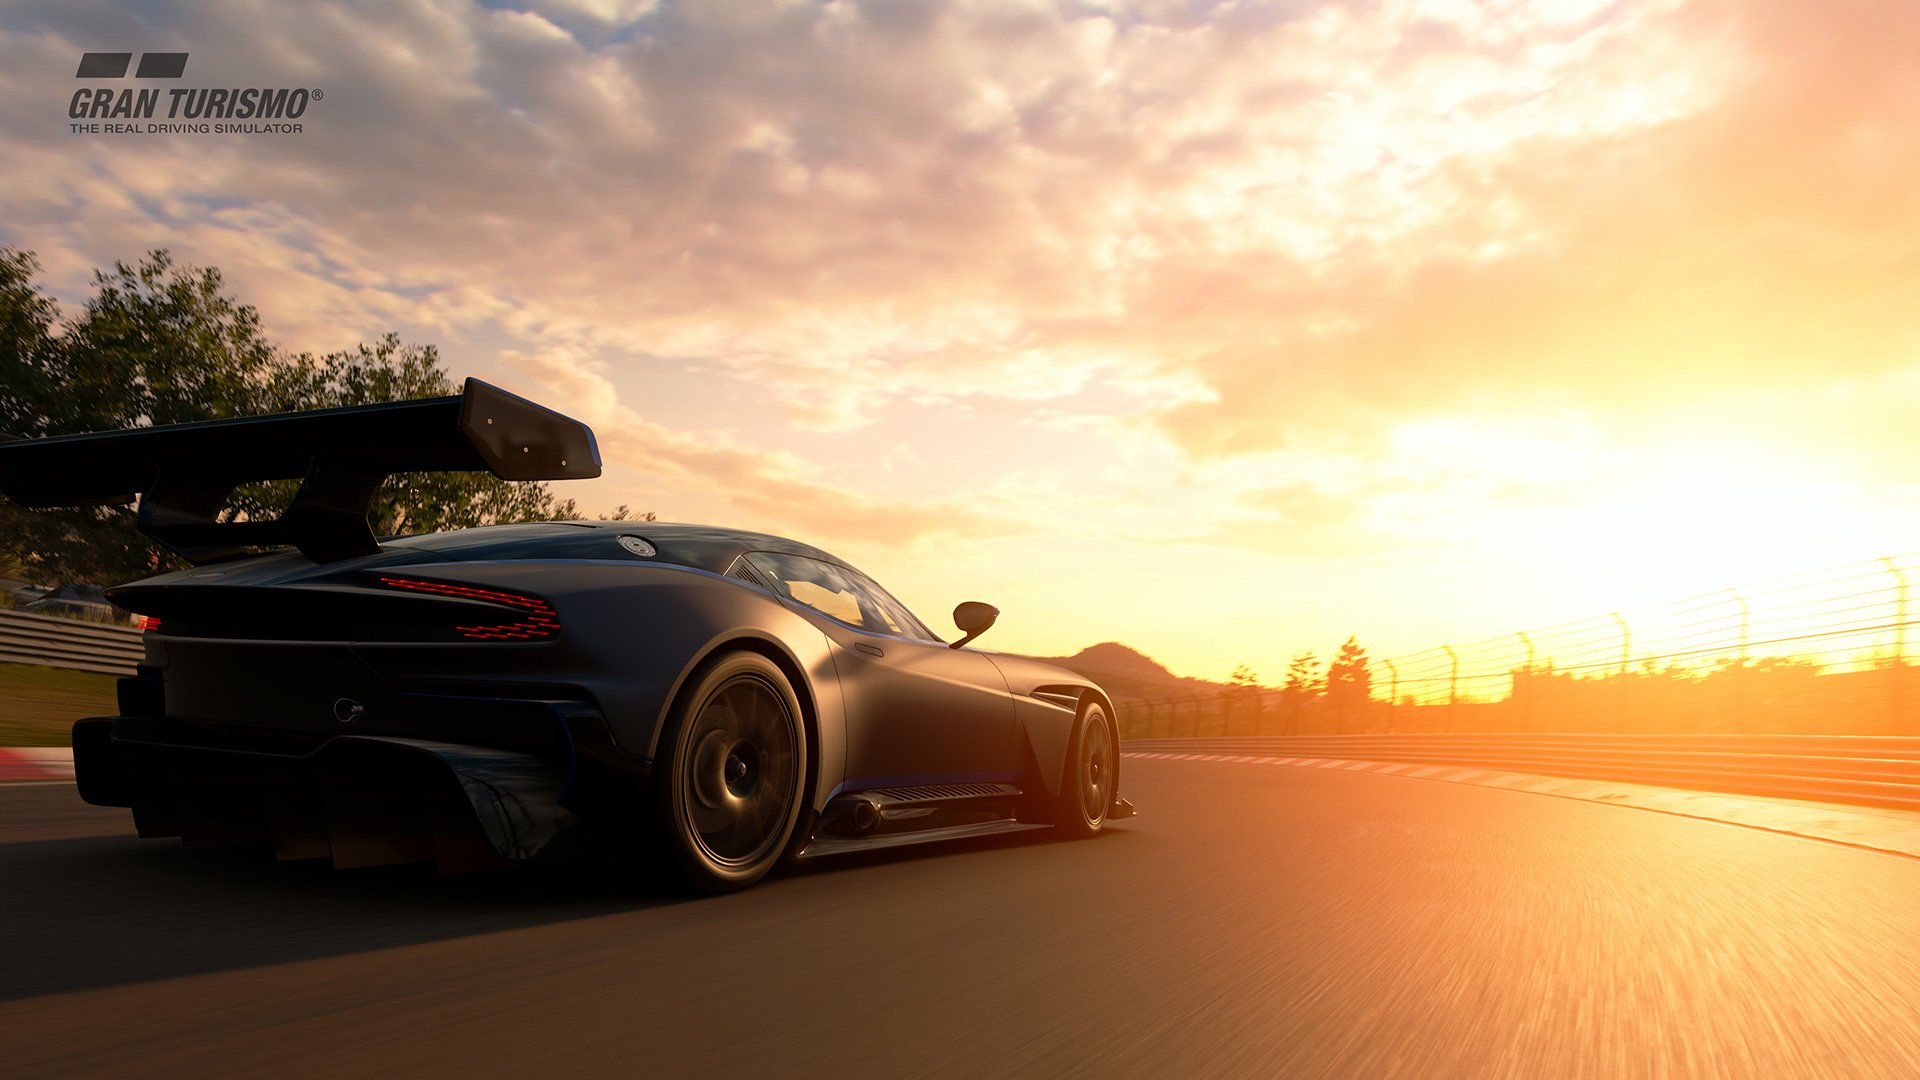 Gran Turismo Sport Aston Martin Vulcan sunset